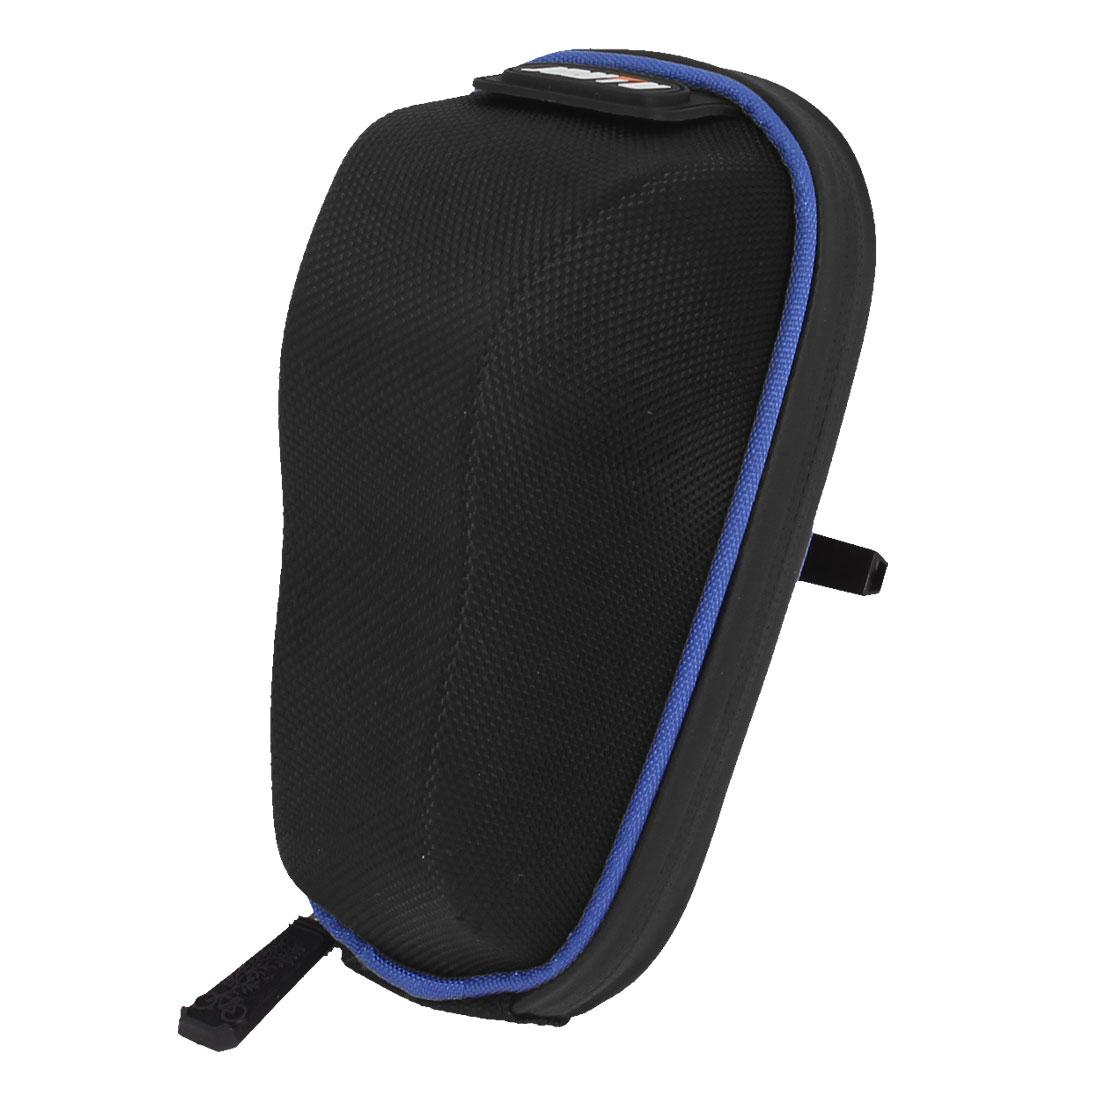 Road Bike Bicycle Black Saddle Pannier Seat Rear Zipper Bag Pouch Holder